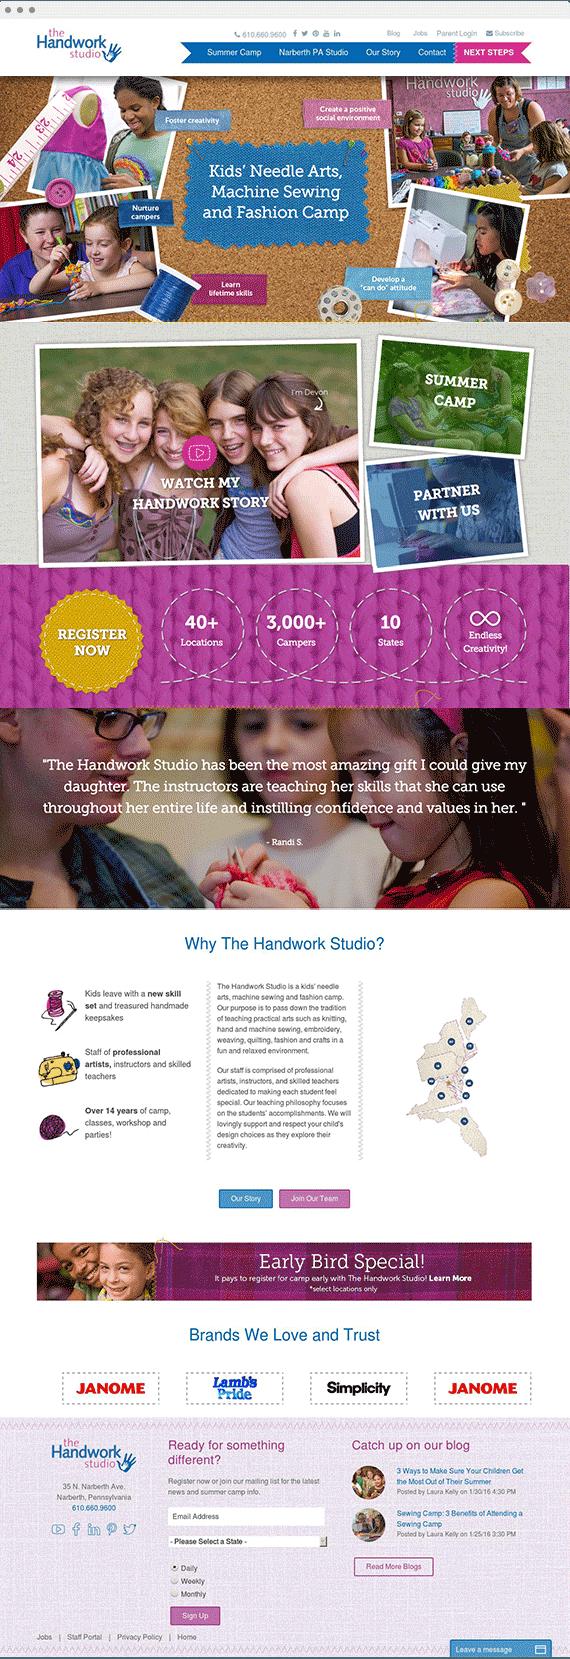 Portfolio-Handwork-Studio-Homepage